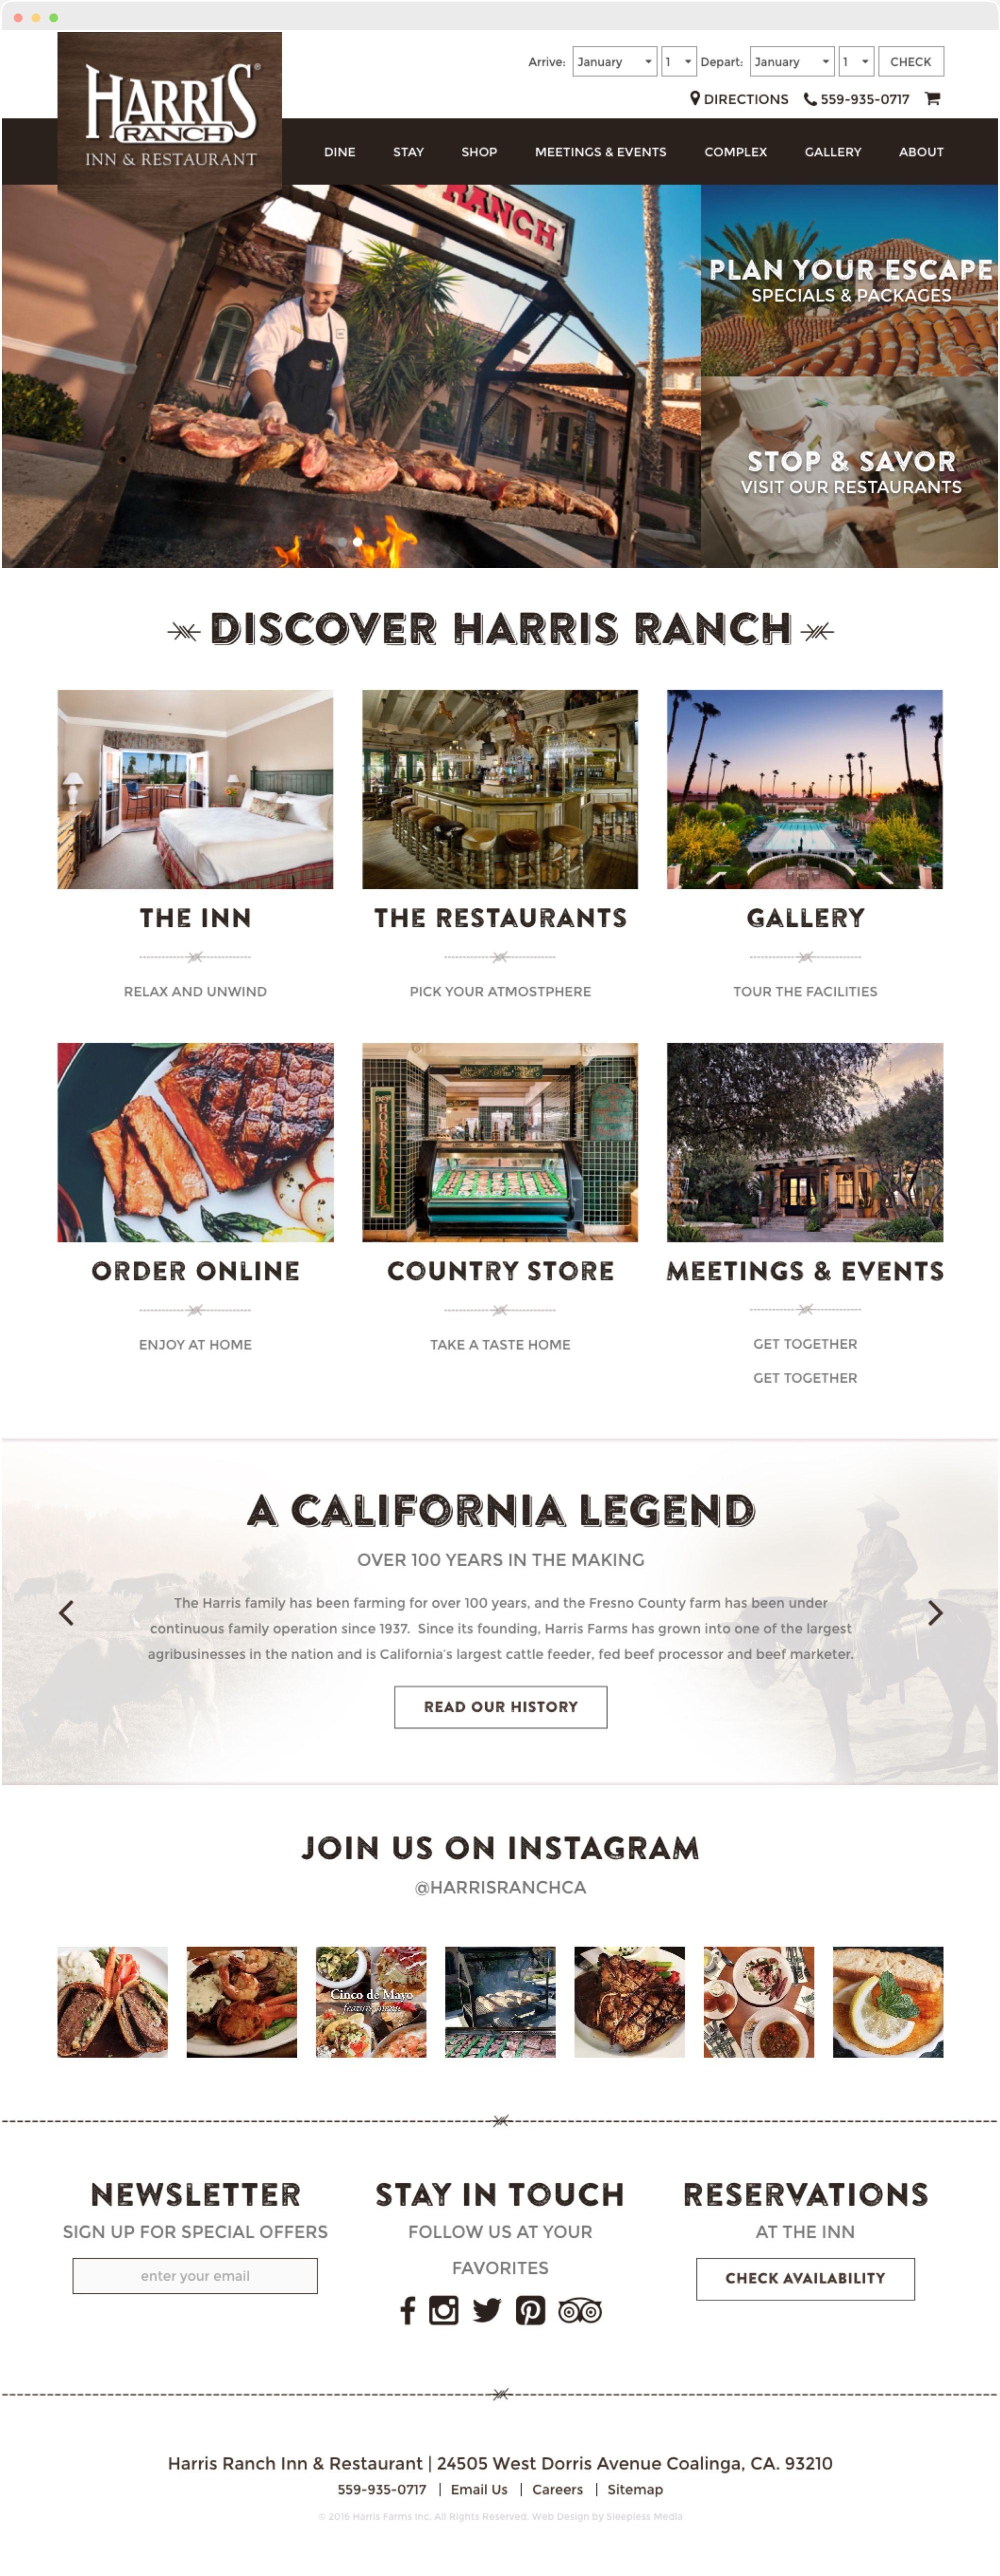 Design Portfolio Harris Ranch Portfolio Web Design Design Website Design Inspiration